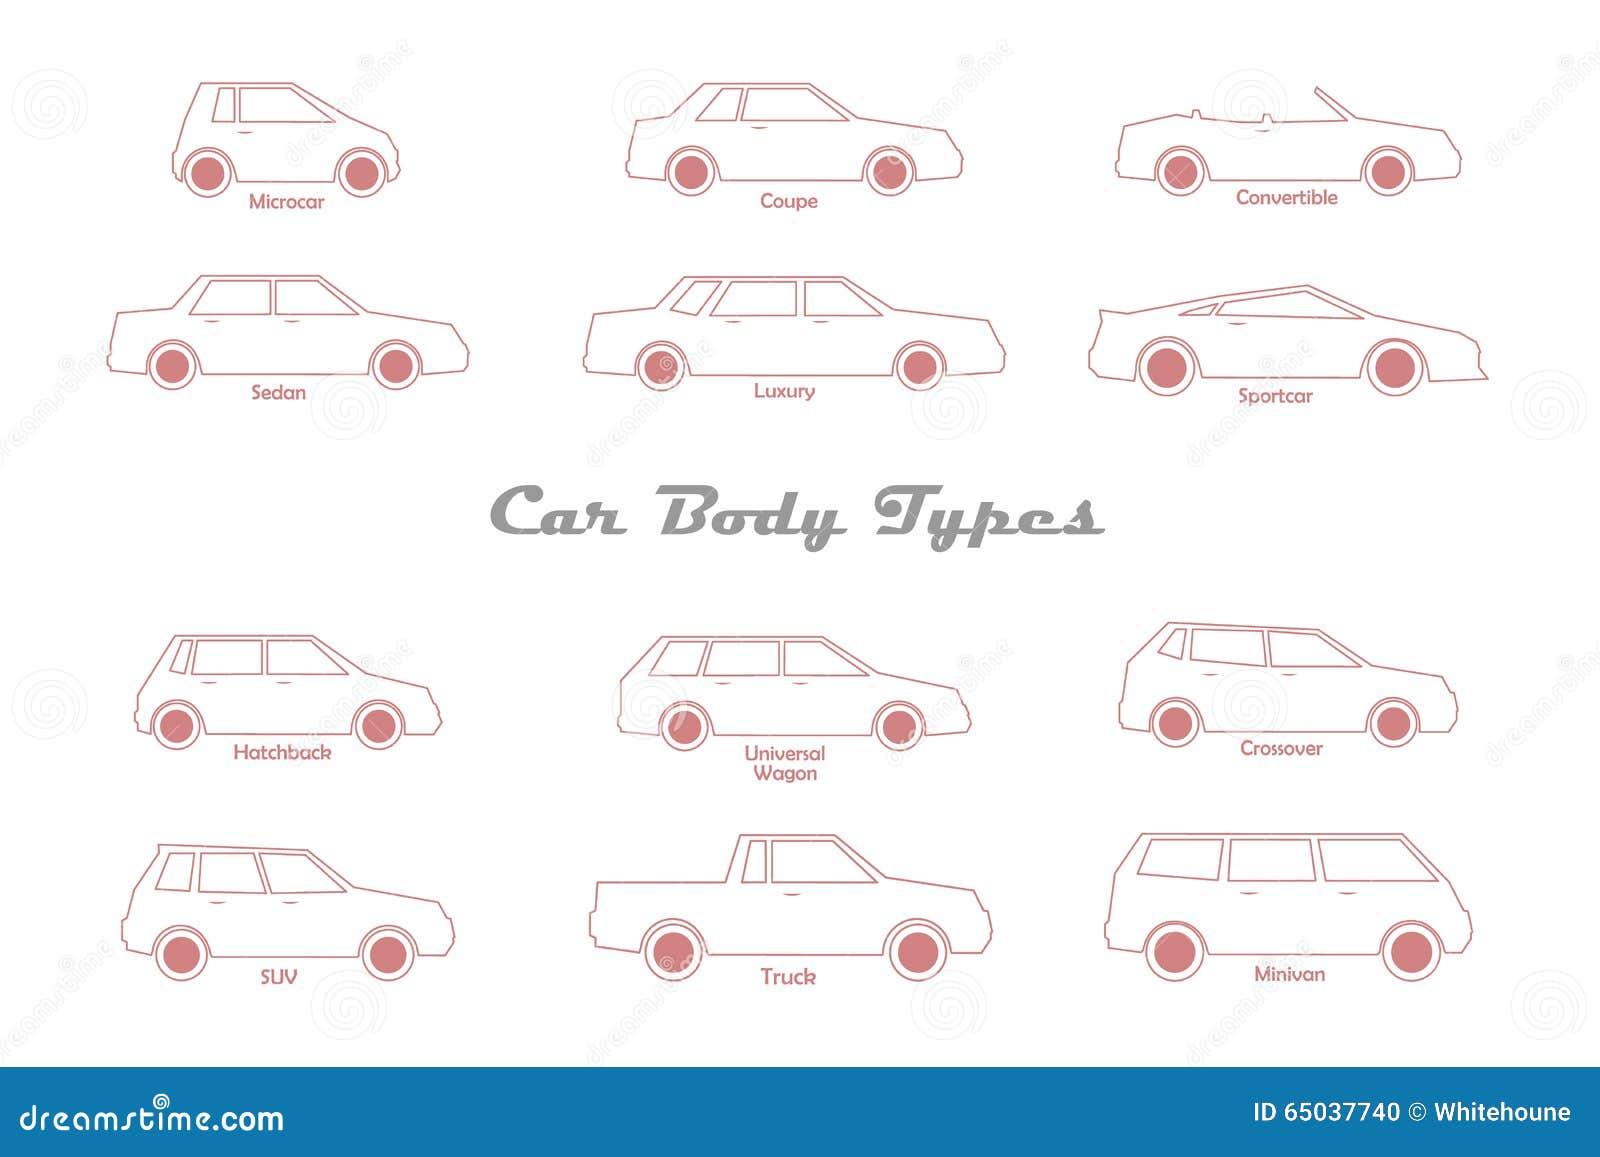 Car Body Types Stock Vector - Image: 65037740